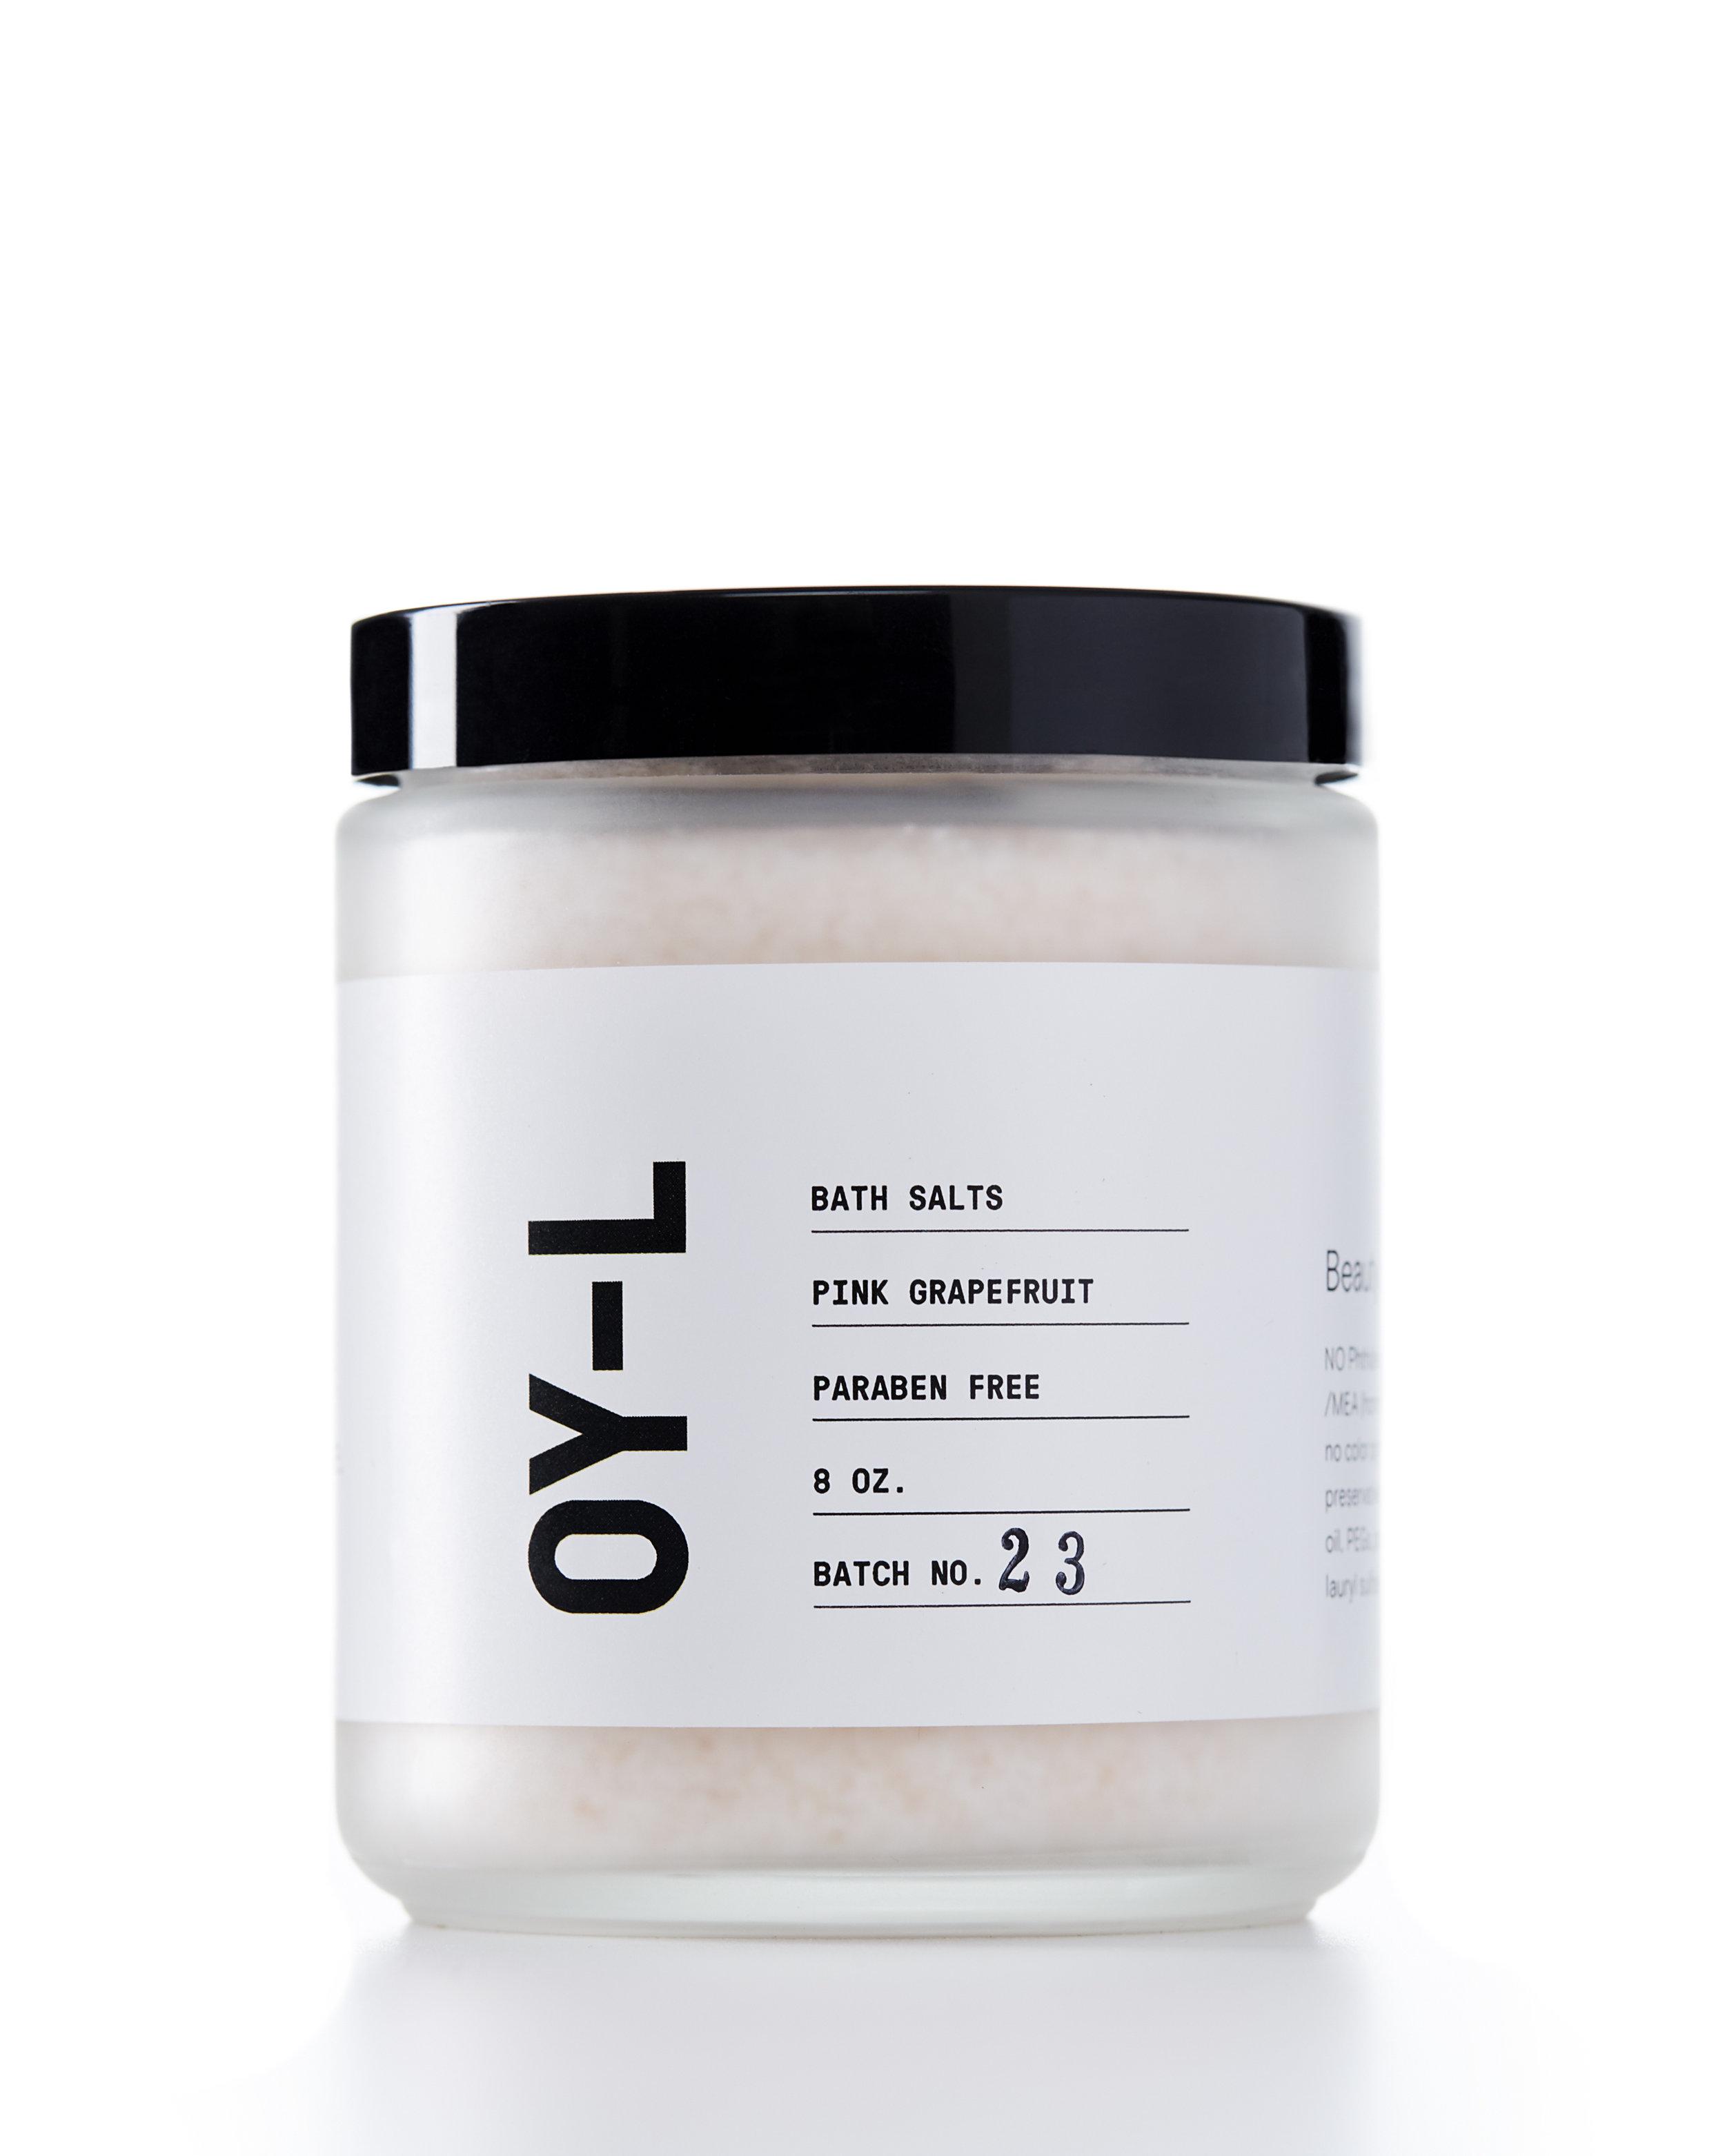 OY-L Pink Grapefruit Bath Salts.jpg